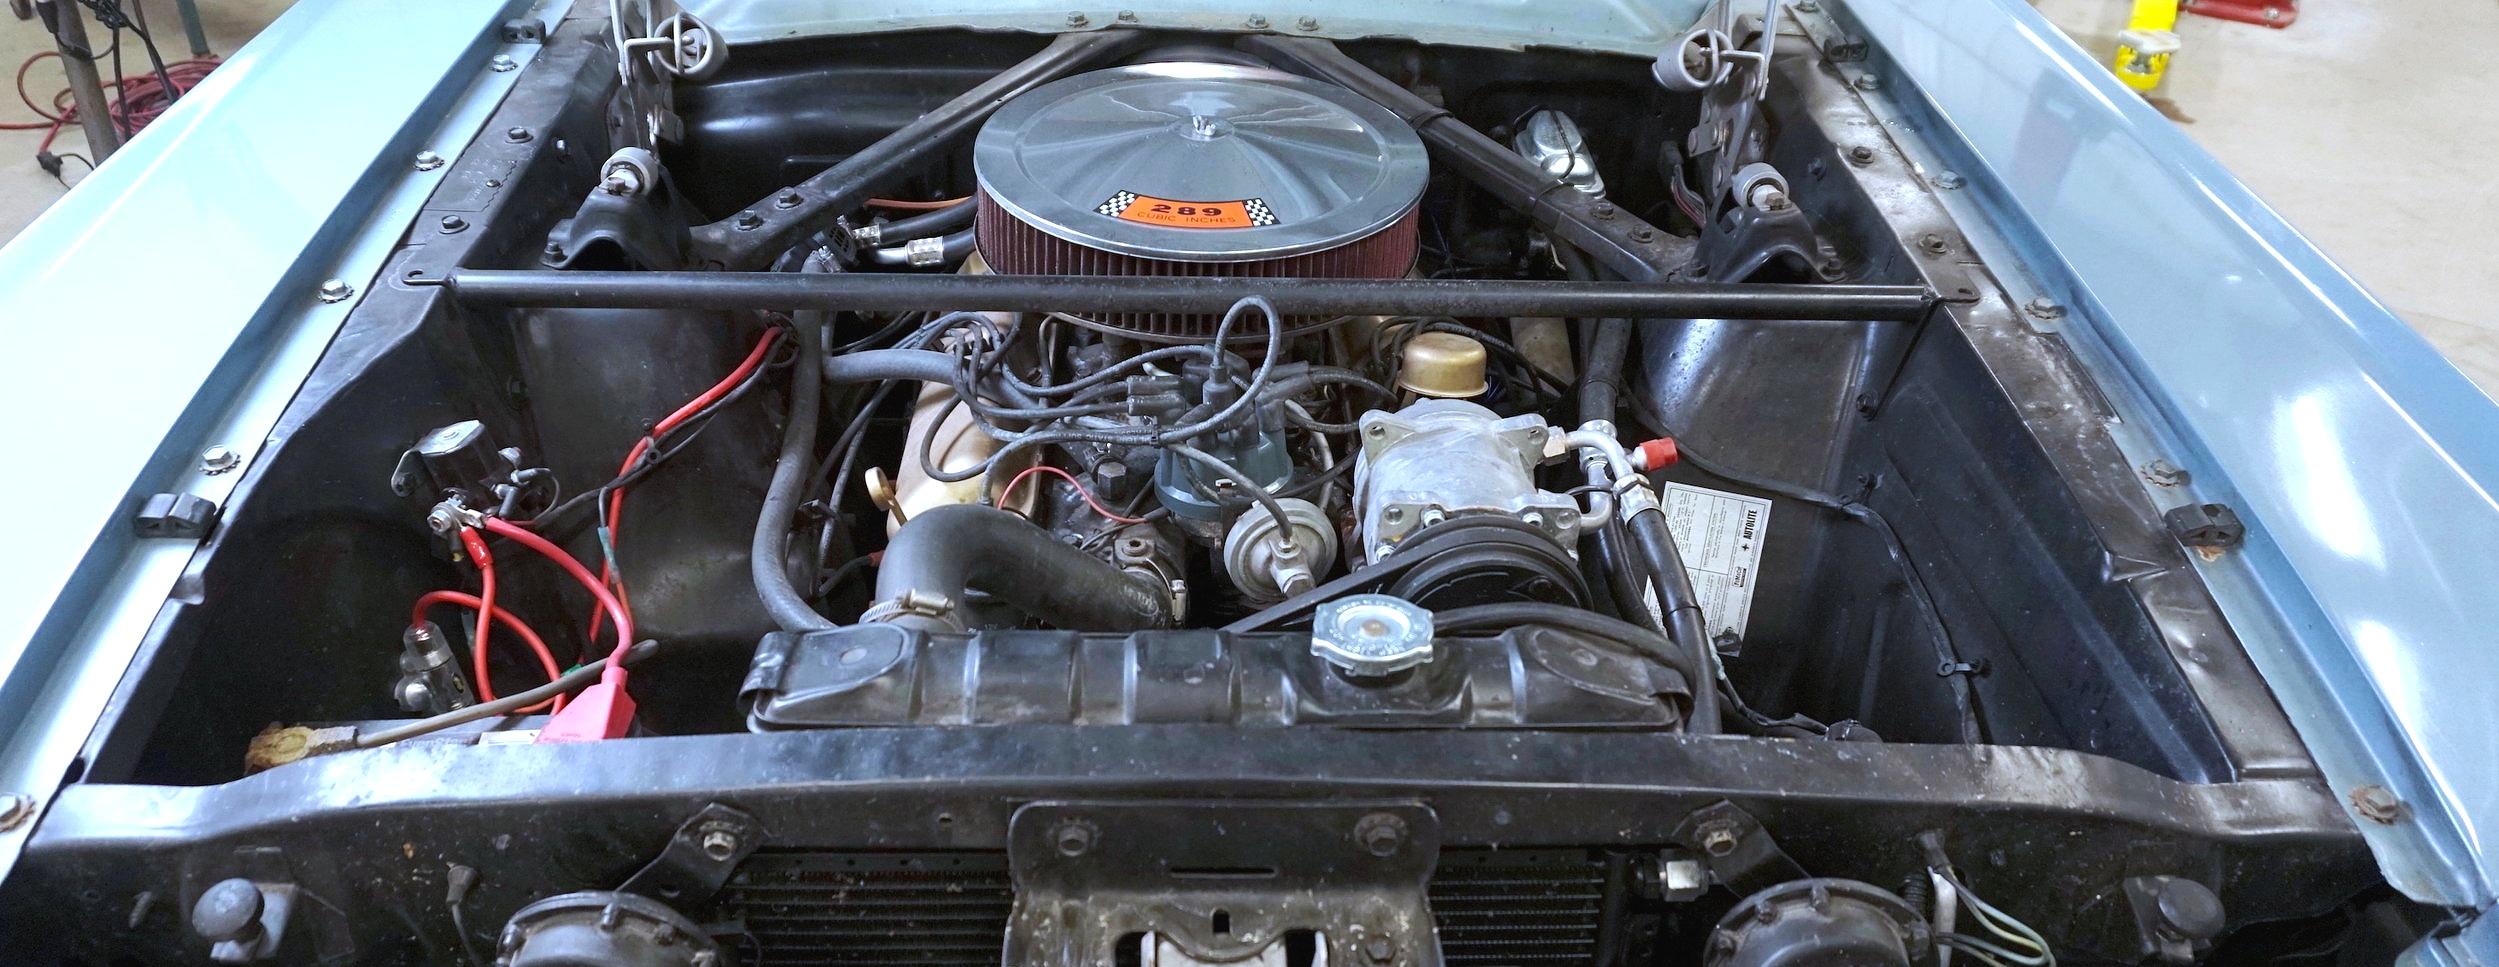 engine+before